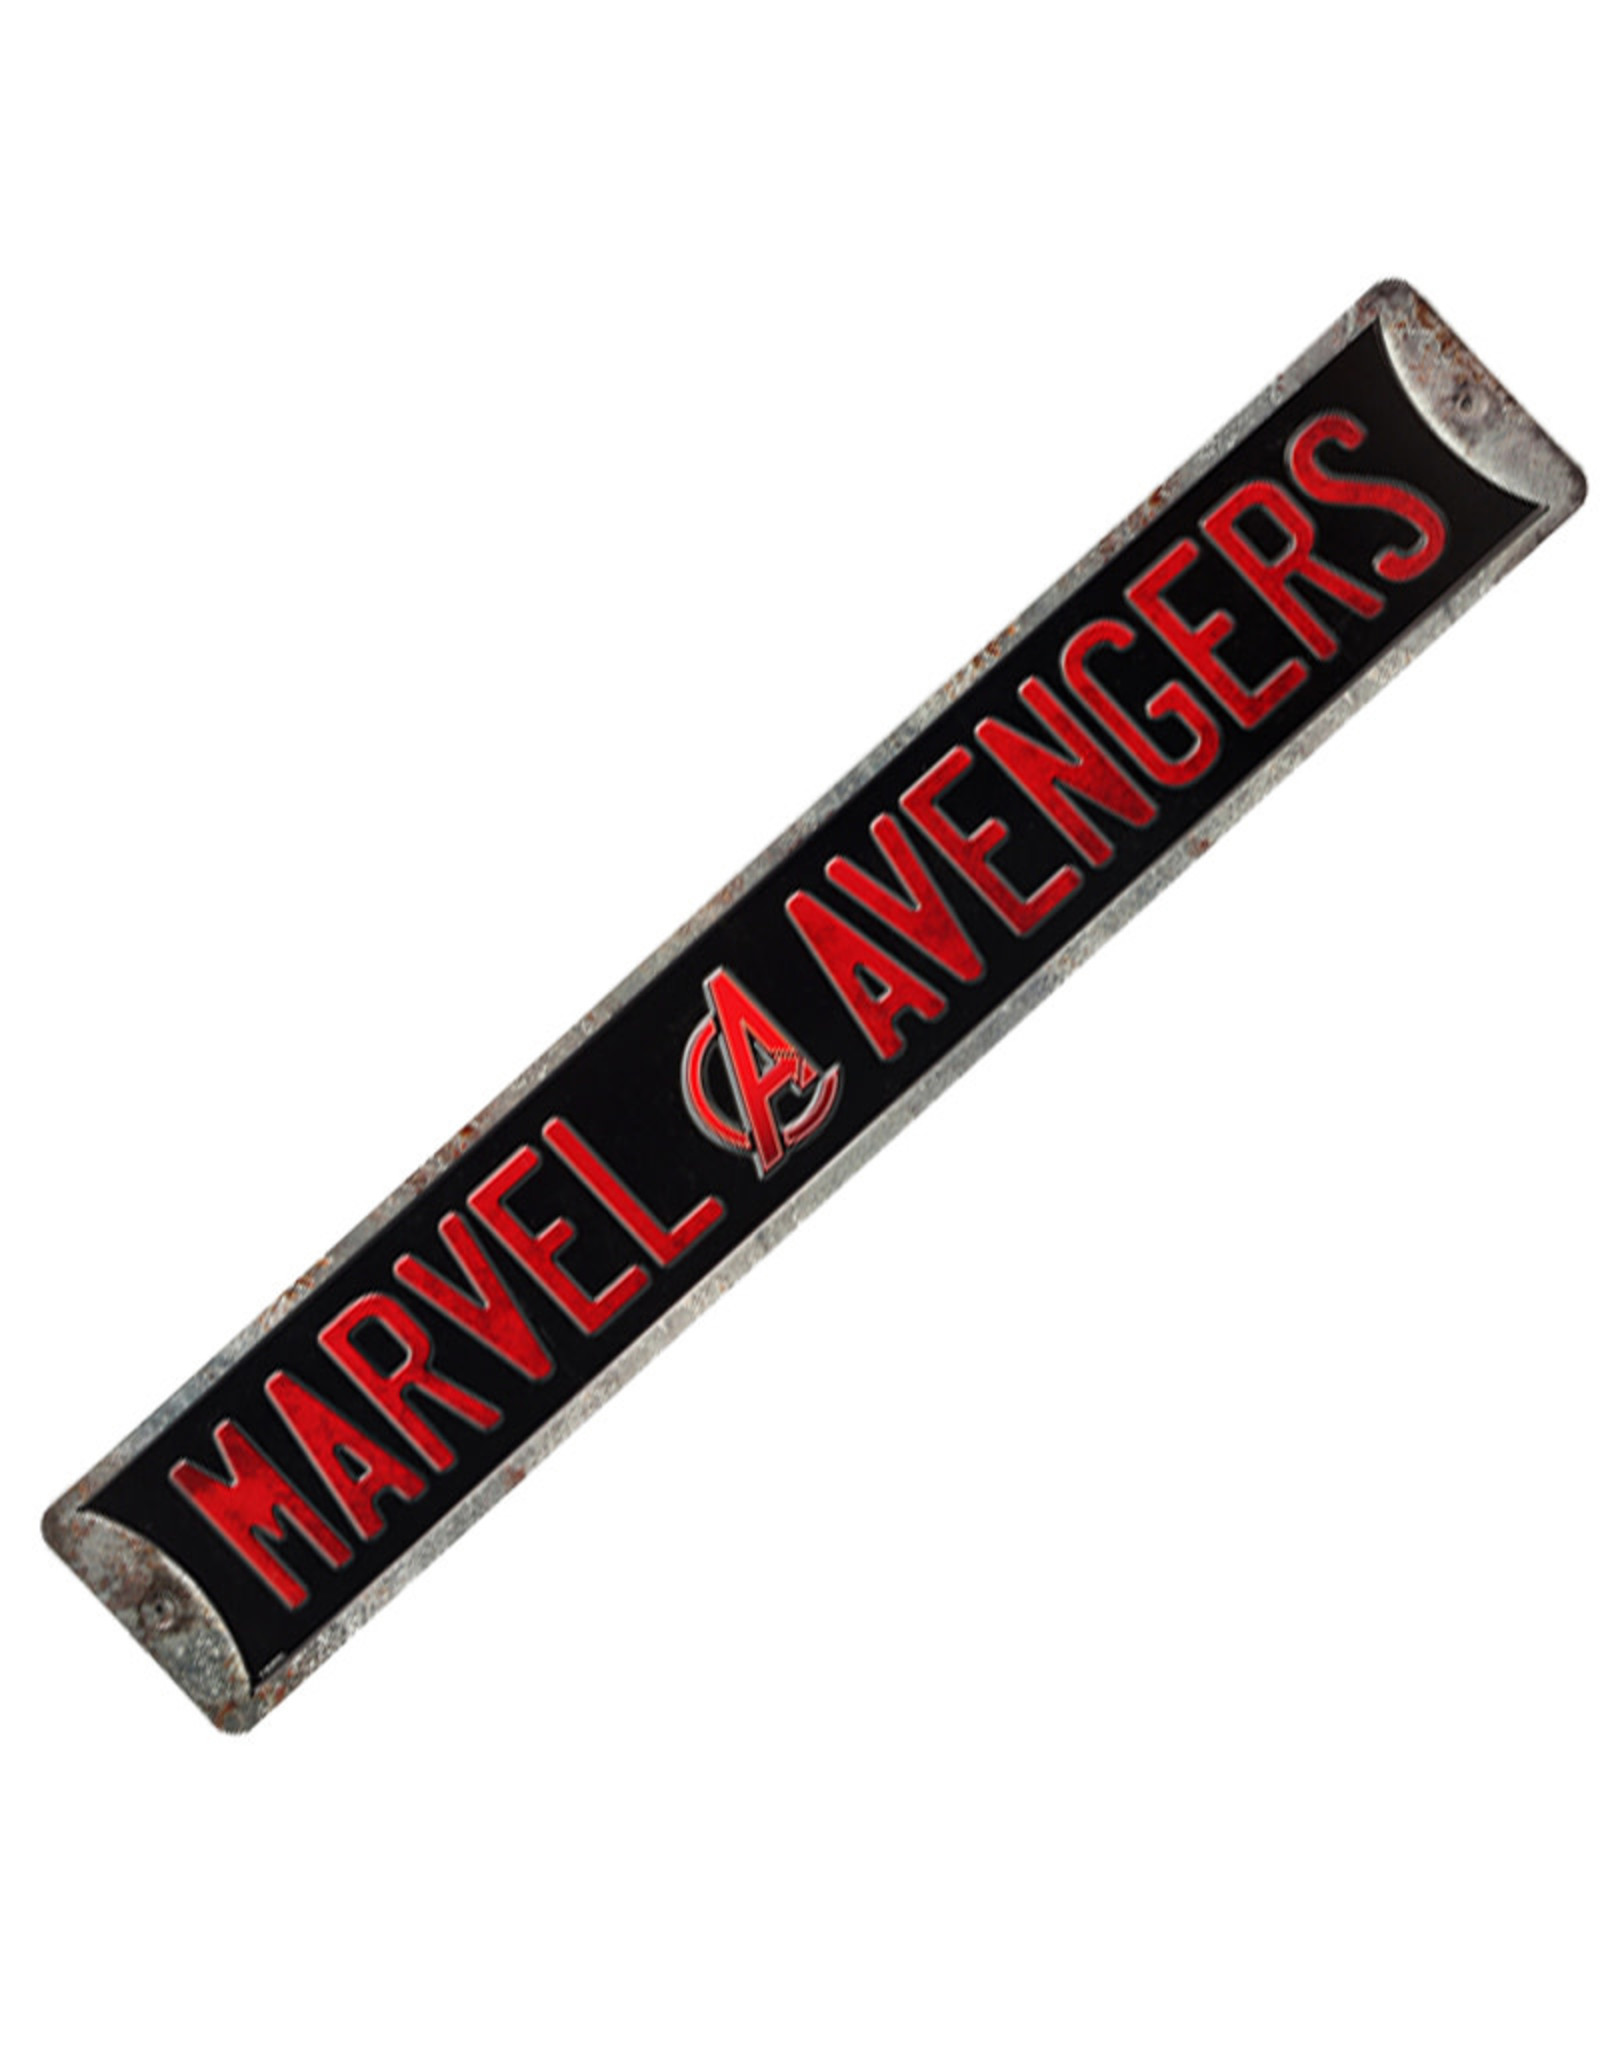 Marvel Marvel ( Embossed Metal Plate ) Avengers